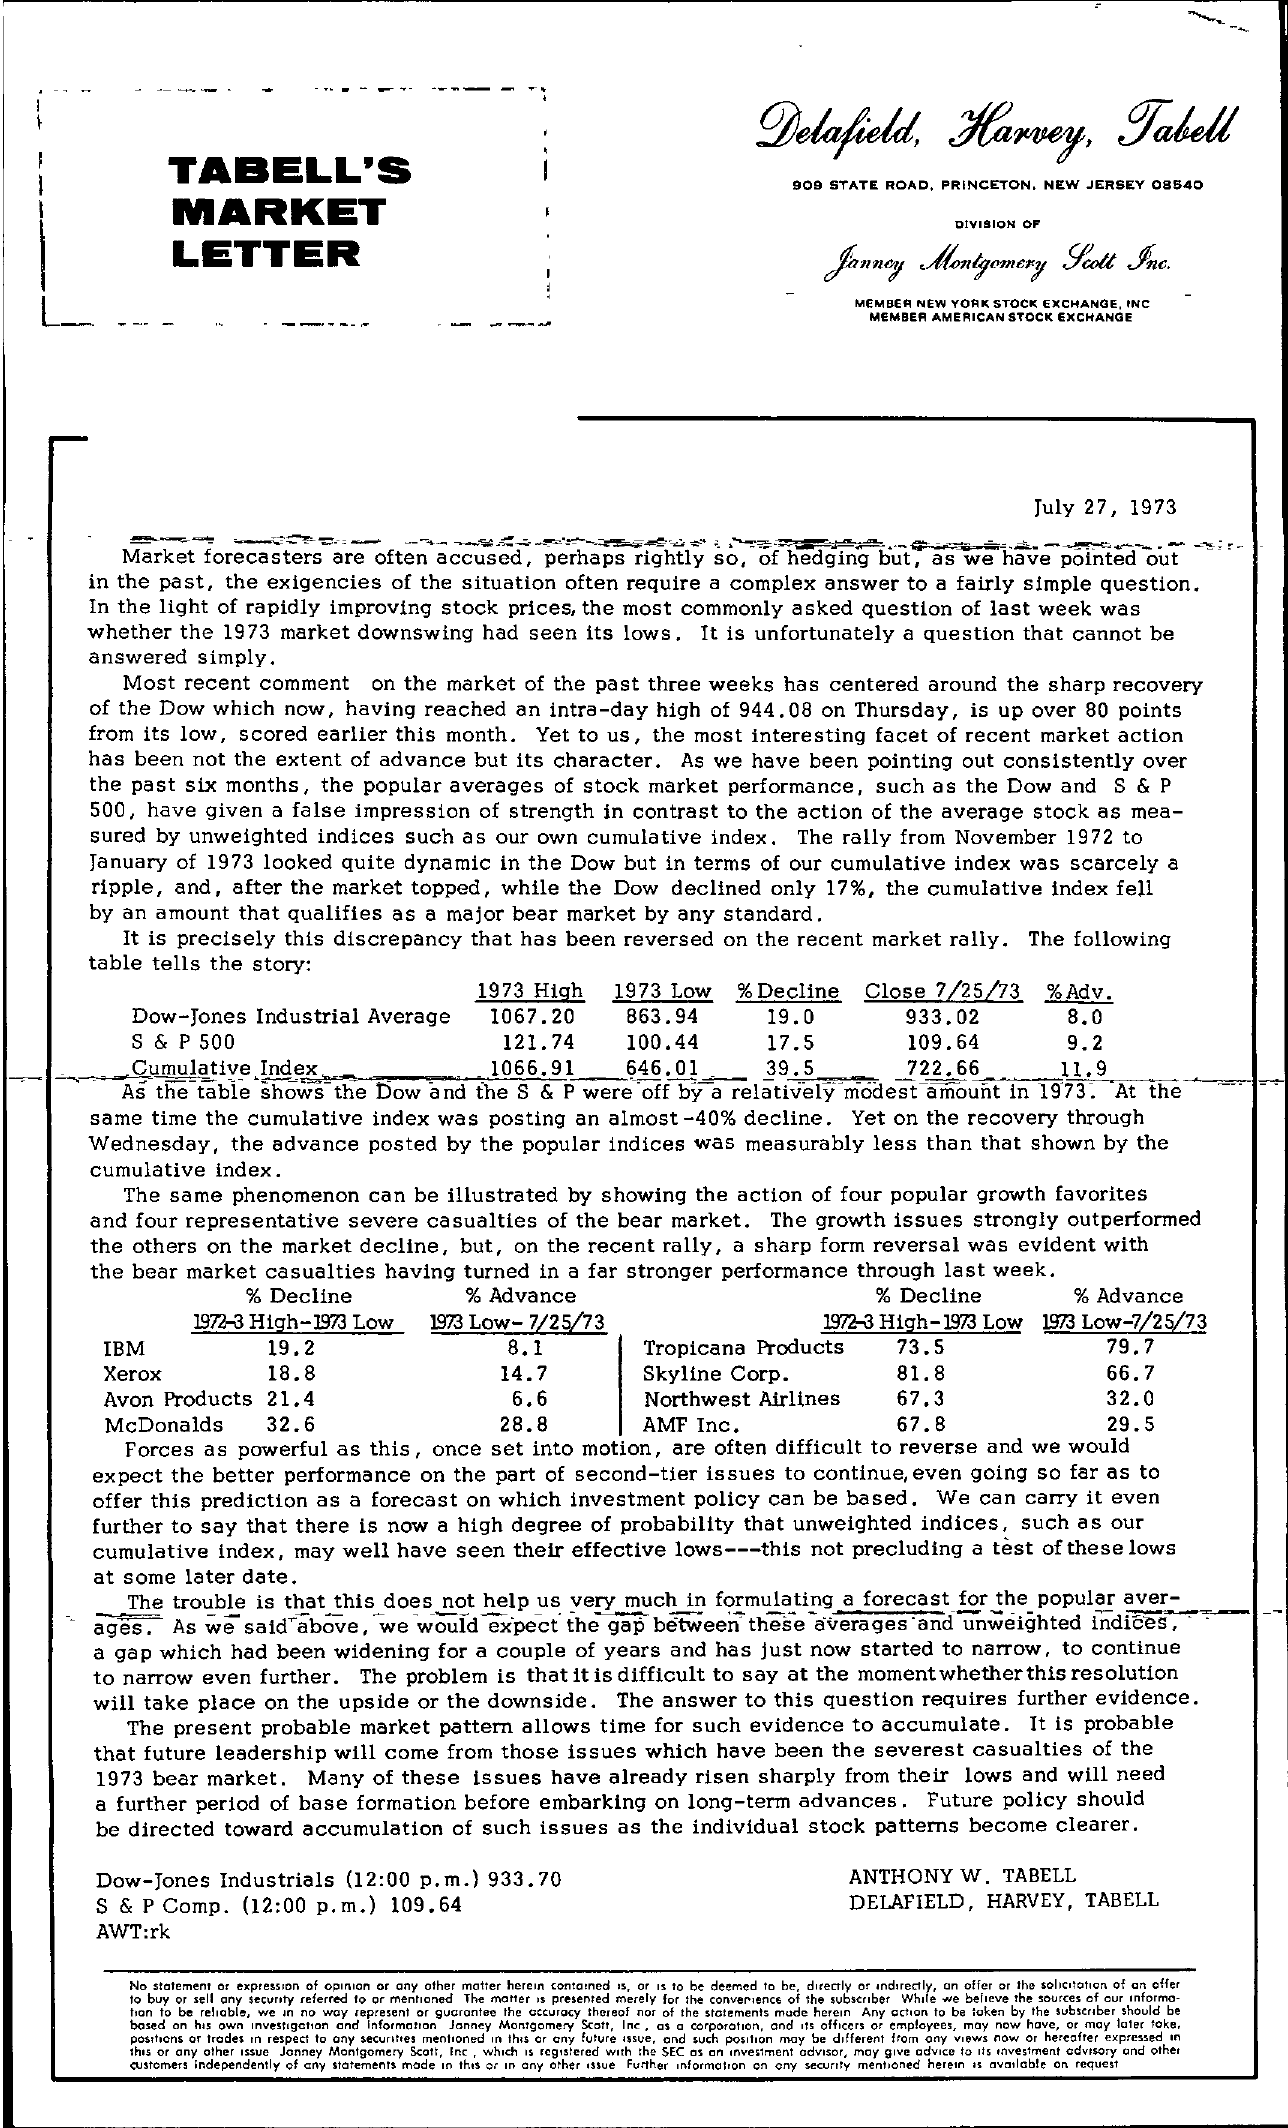 Tabell's Market Letter - July 27, 1973